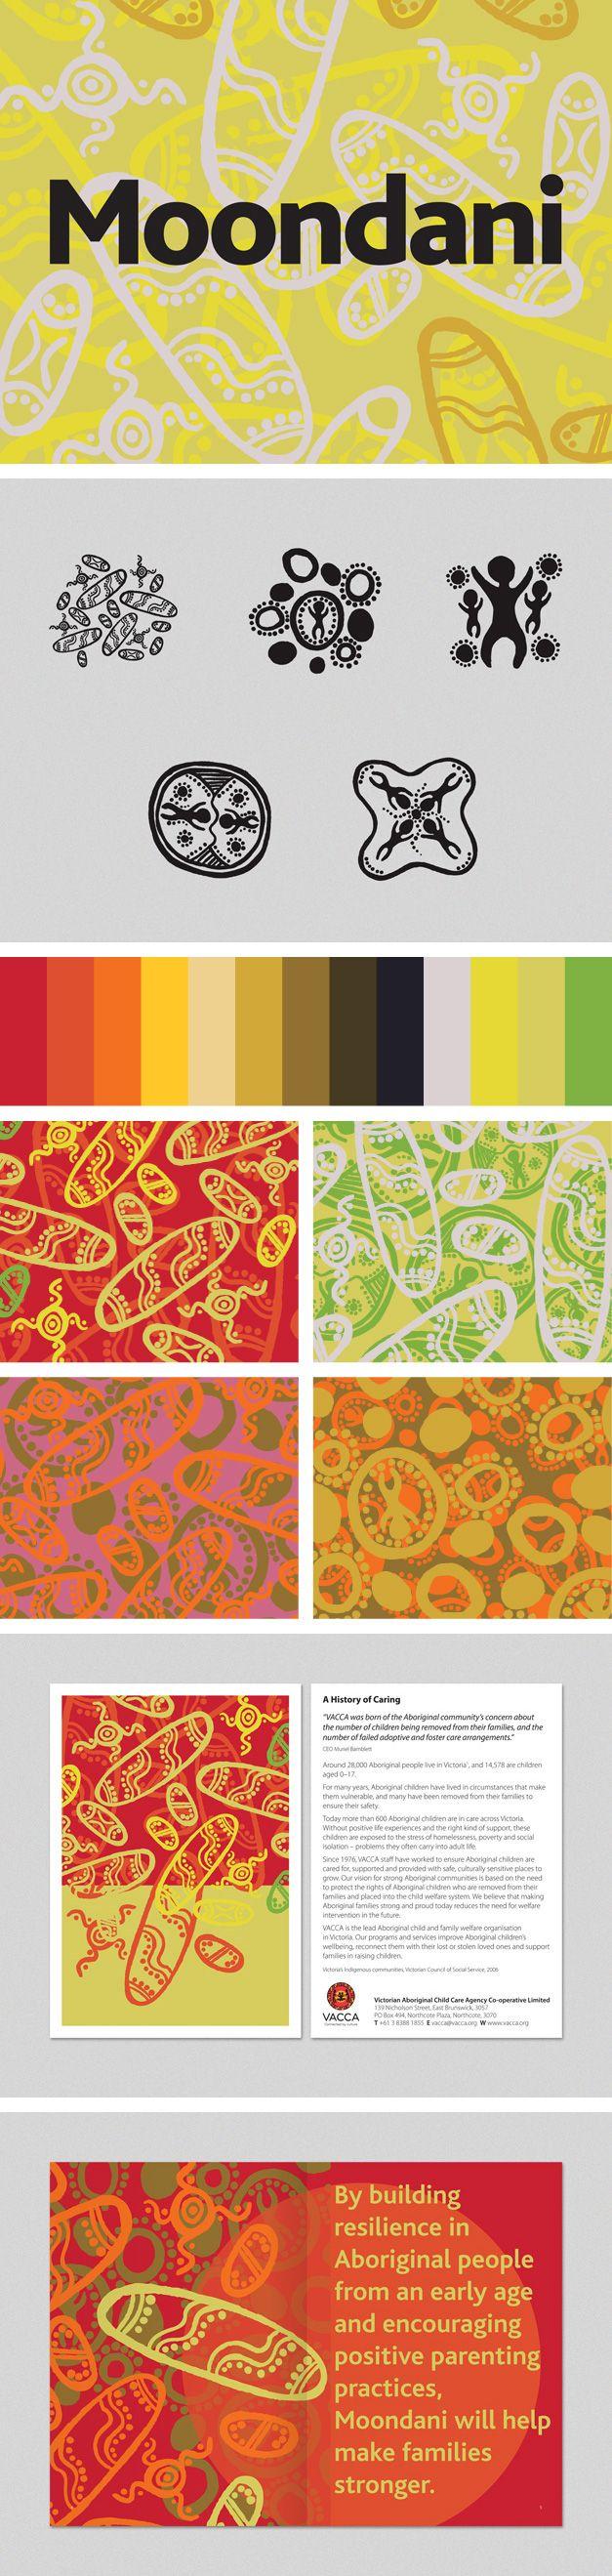 Moondani Cultural Centre branding for the Victorian Aboriginal Child Care Agency www.fenton.com.au #communication #PR #branding #graphicdesign